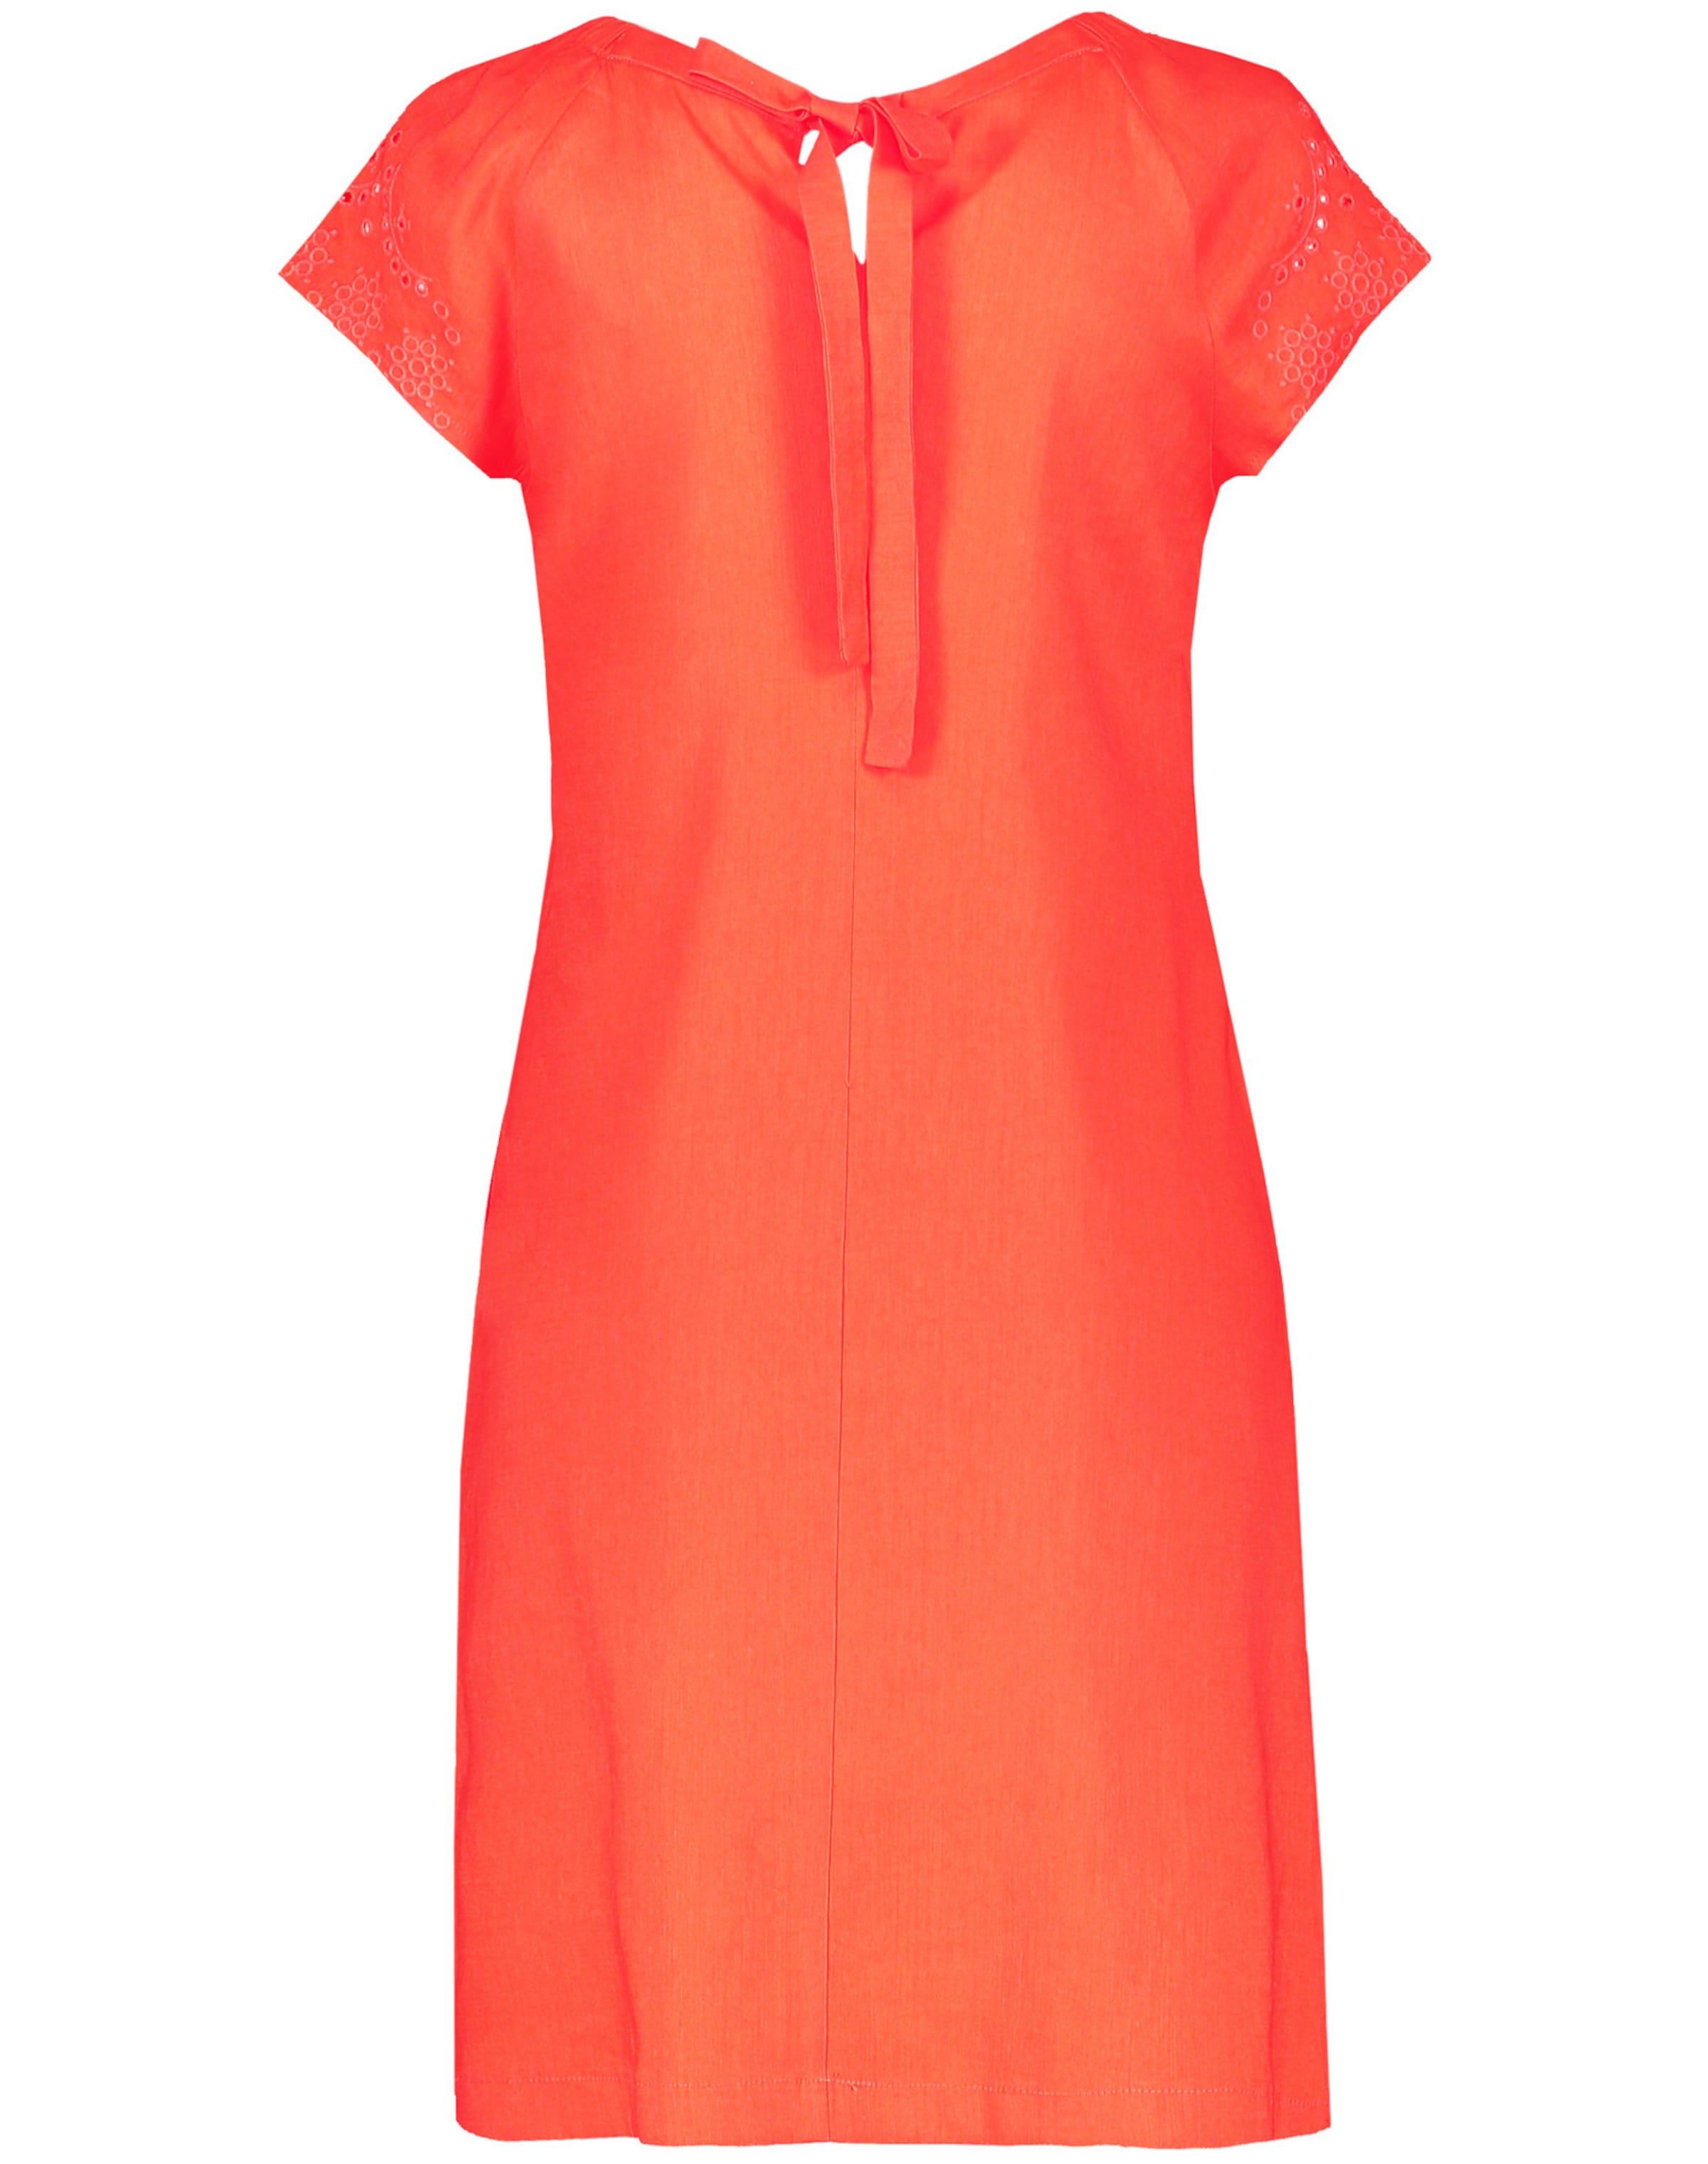 TAIFUN Kleid in orangerot